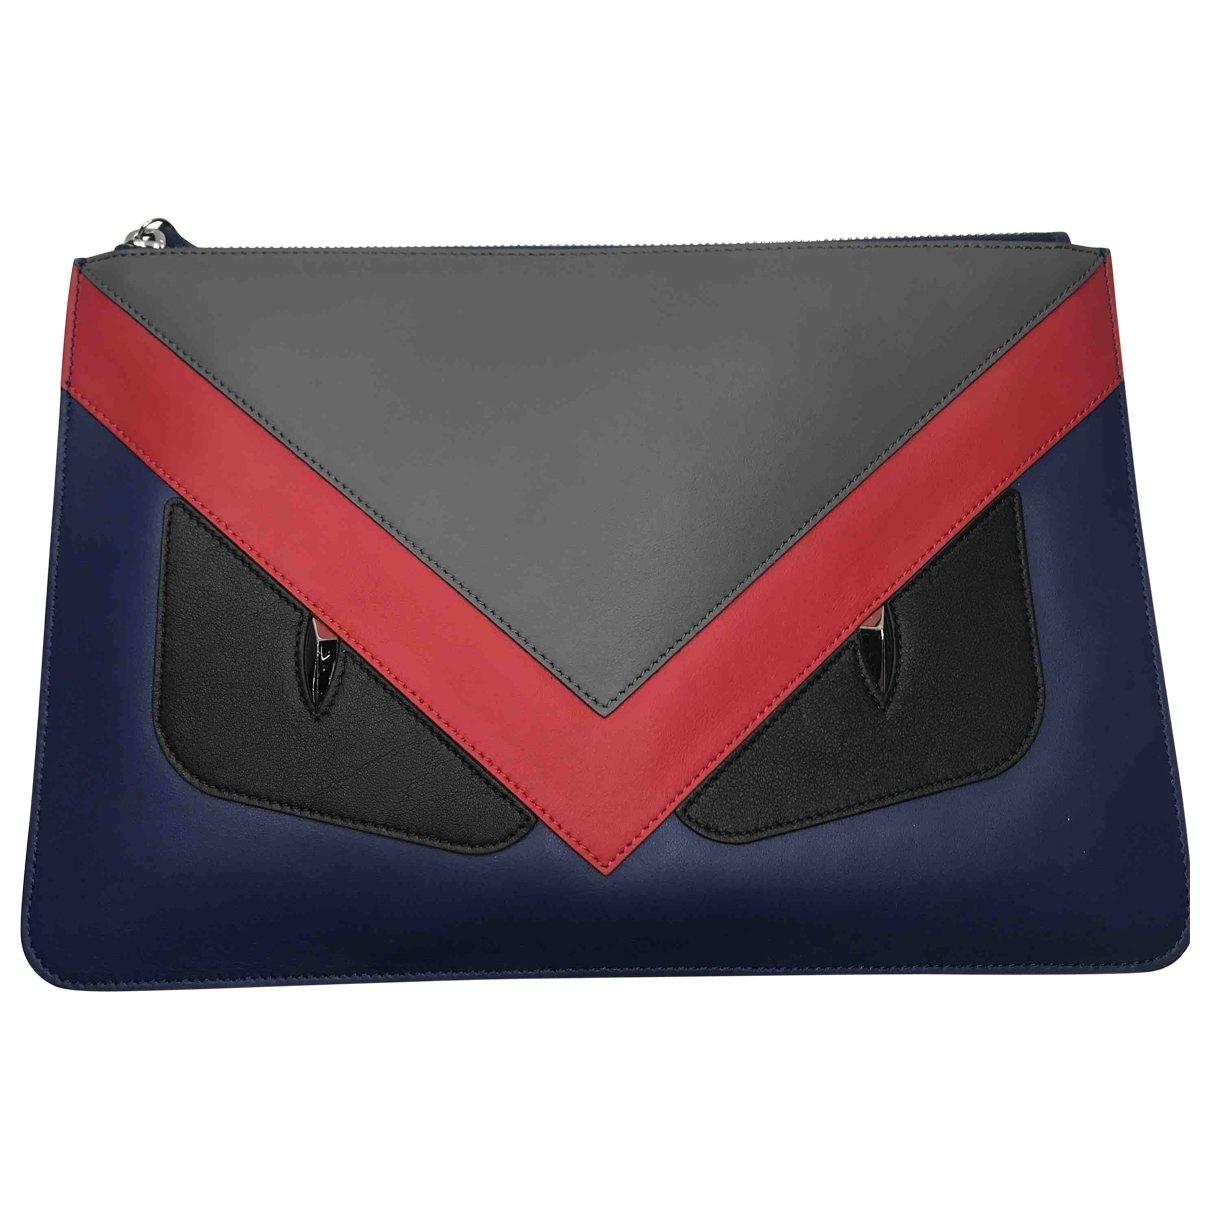 Fendi \N Multicolour Leather Small bag, wallet & cases for Men \N